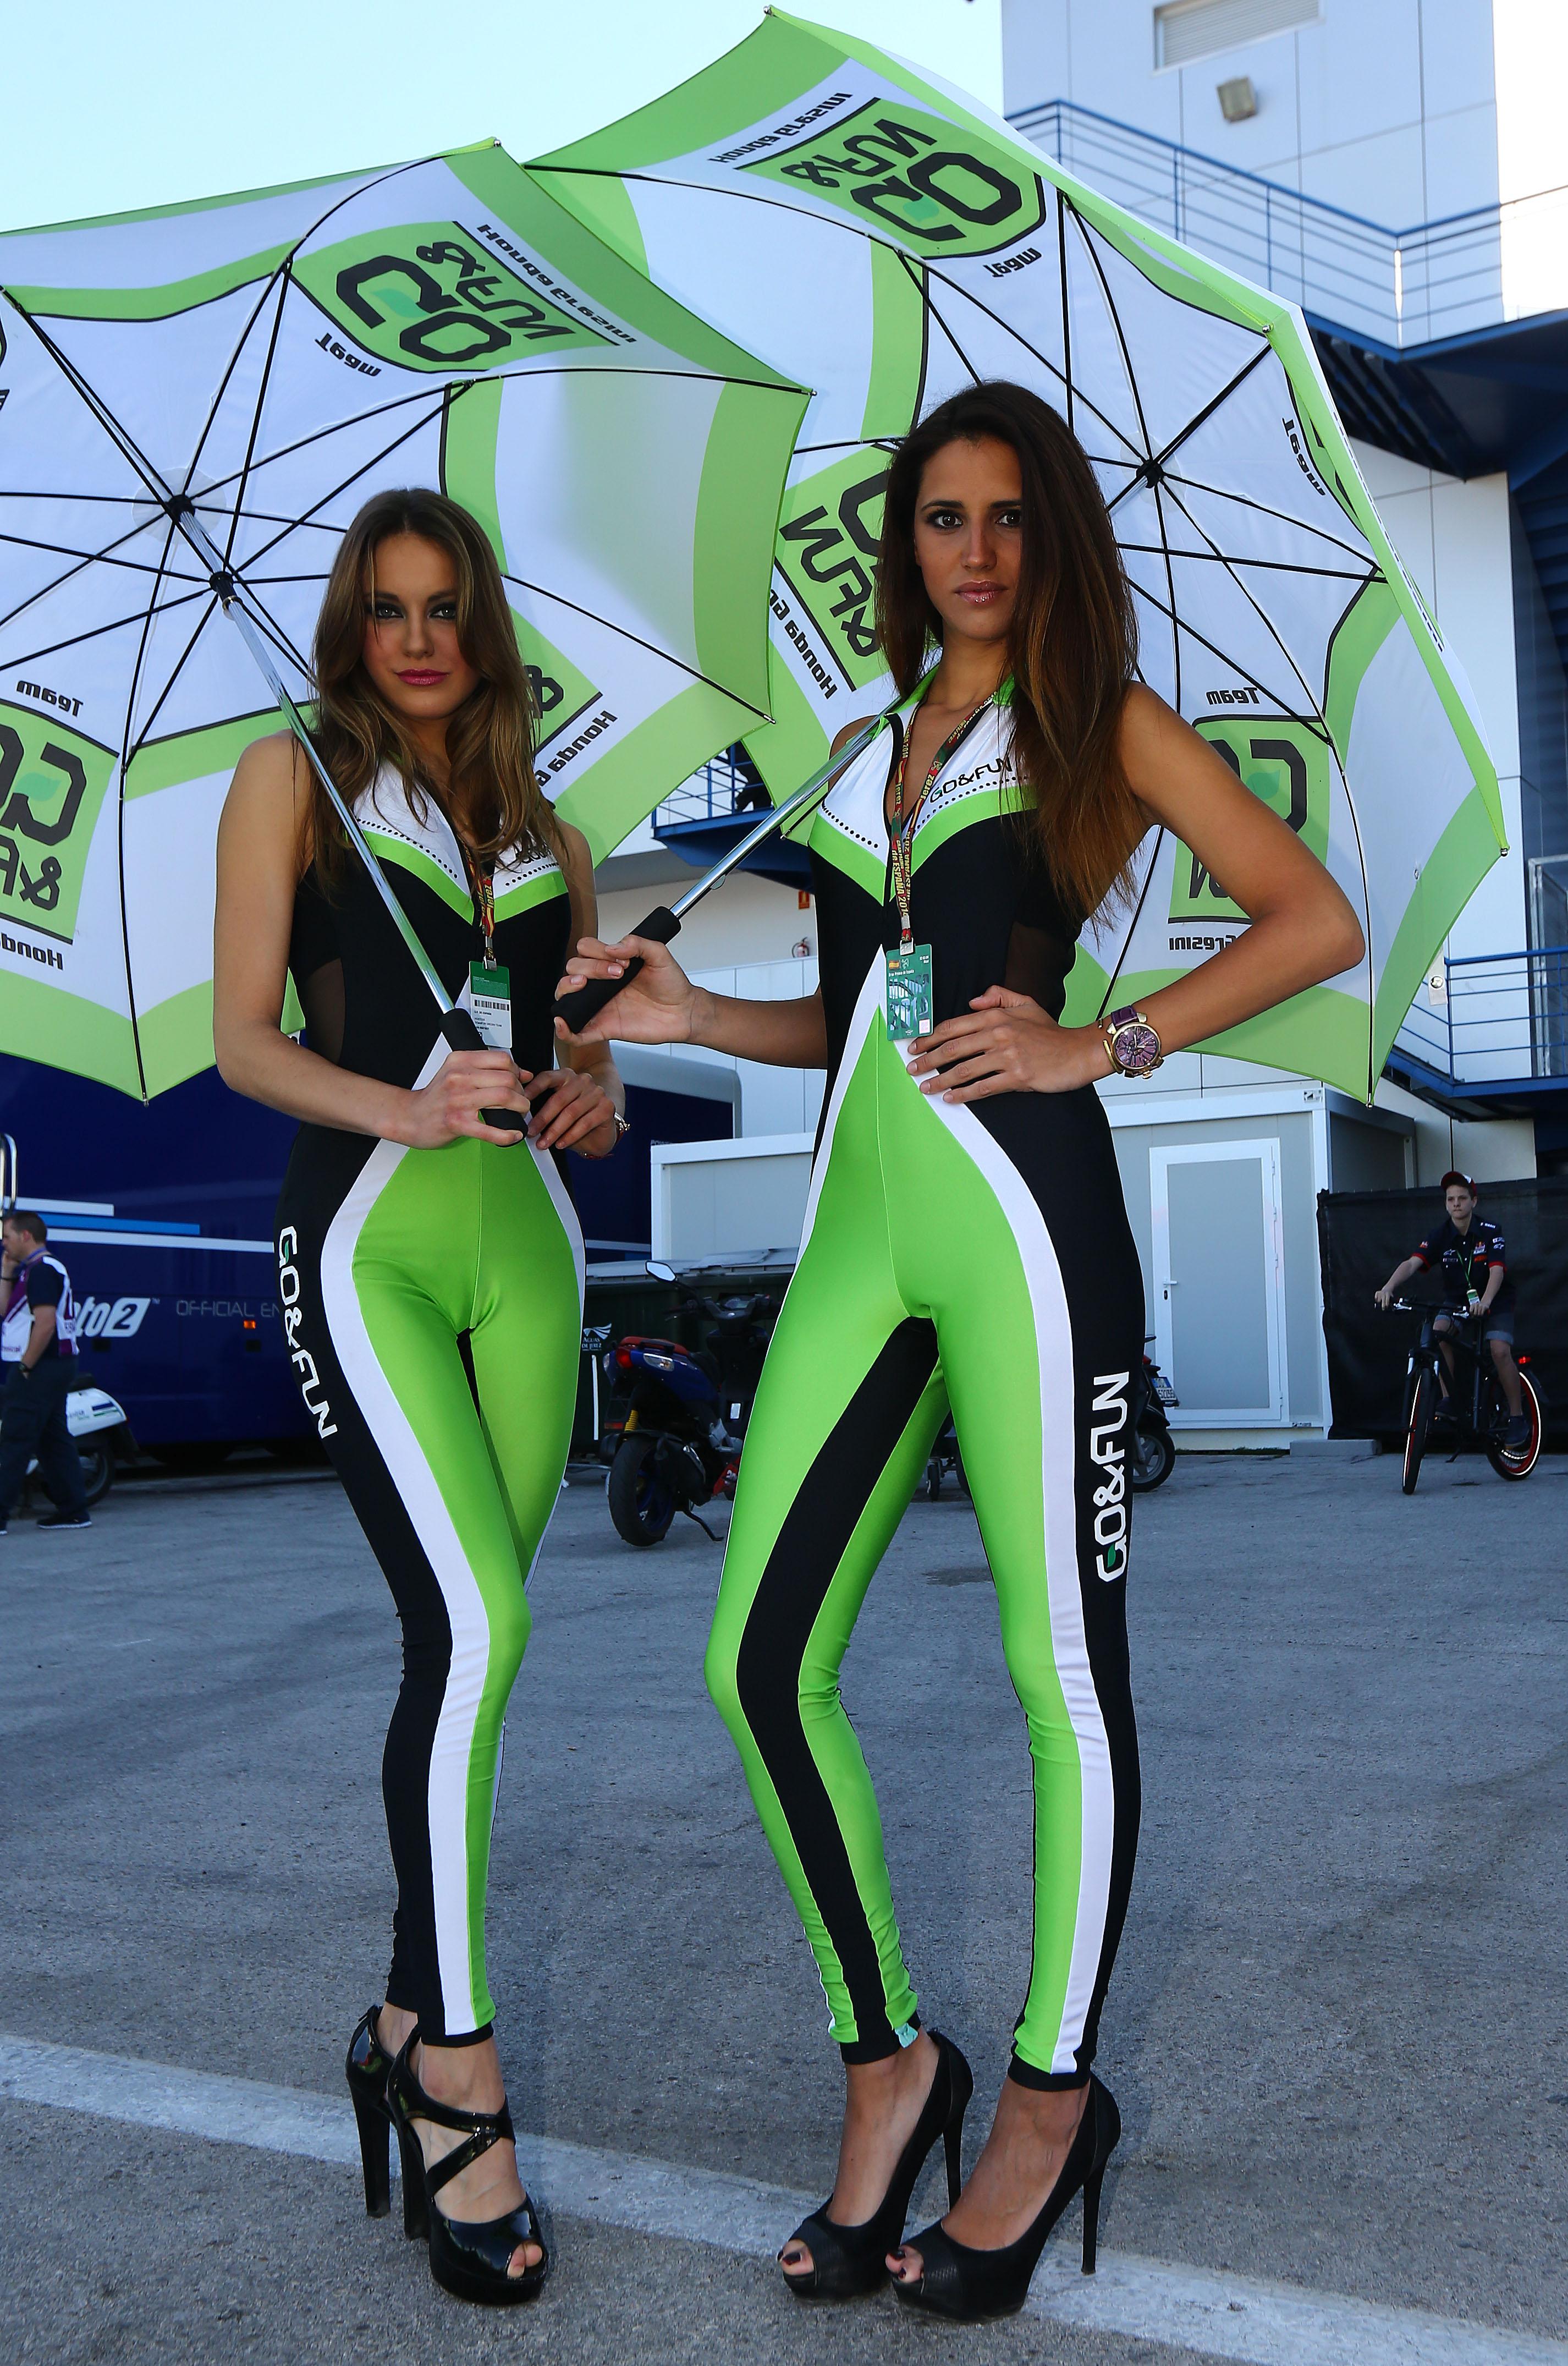 2018 Catalunya MotoGP   Grid Girls Gallery   MCNews.com.au